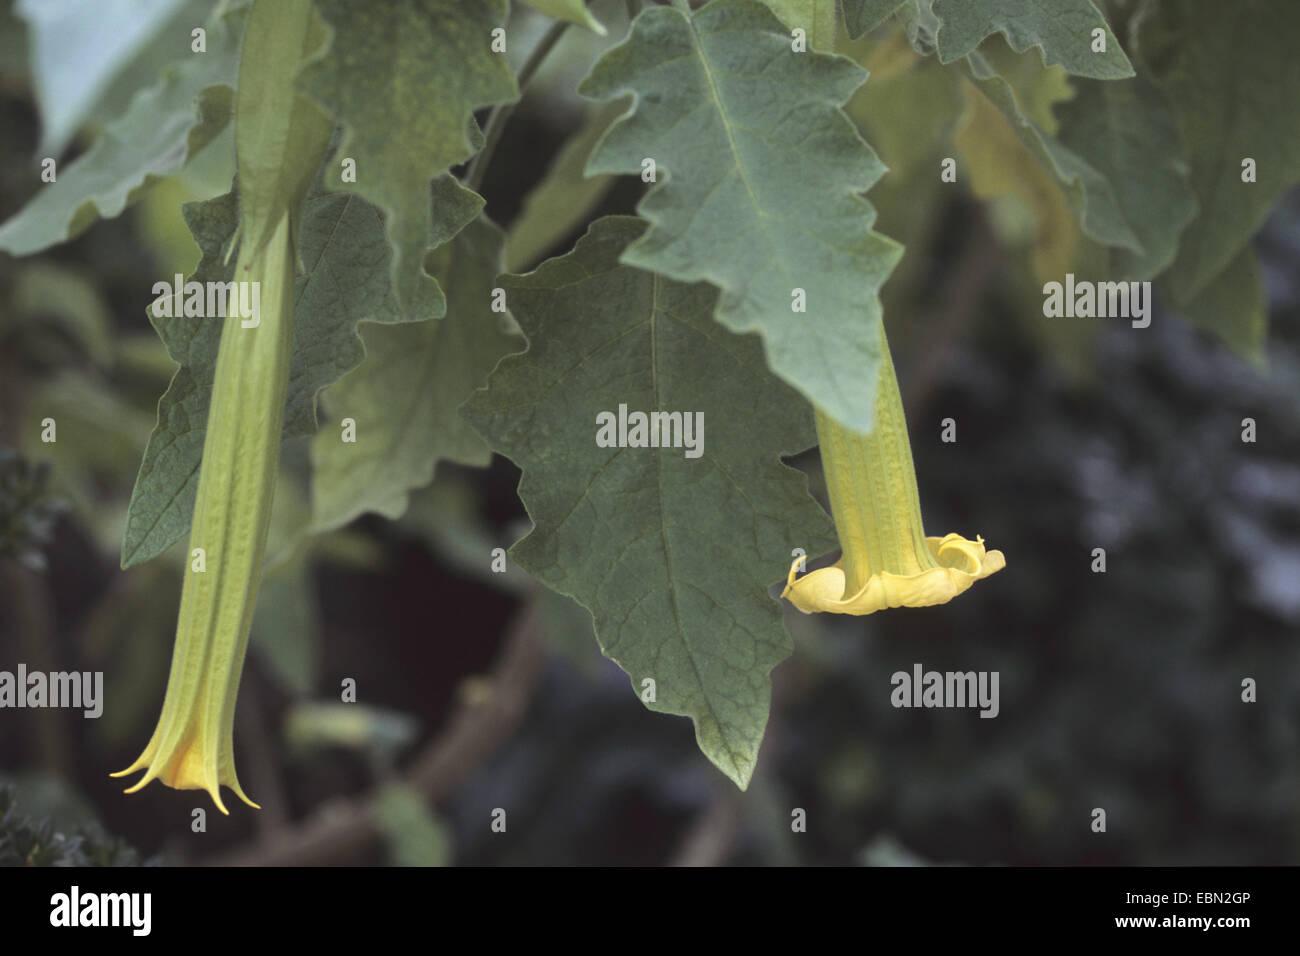 "Angel's Trumpet tree (Brugmansia sanguinea ""Oro Verde"", Brugmansia sanguinea Oro Verde), flores Imagen De Stock"